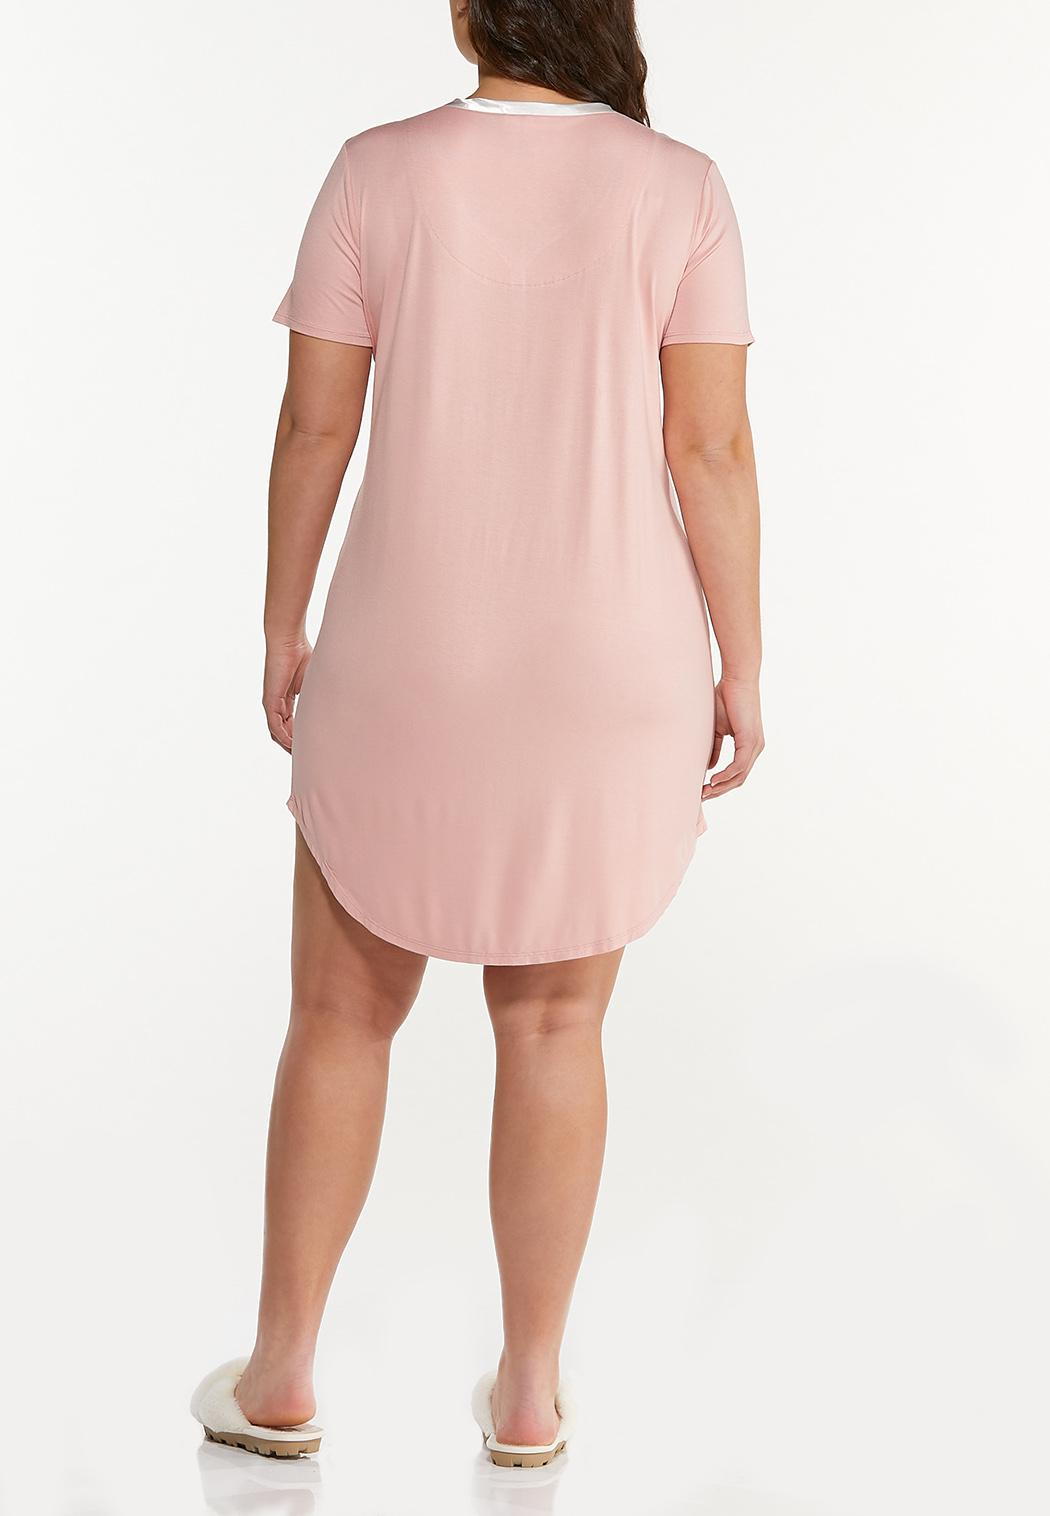 Plus Size Satin Trim Sleep Shirt (Item #44591878)